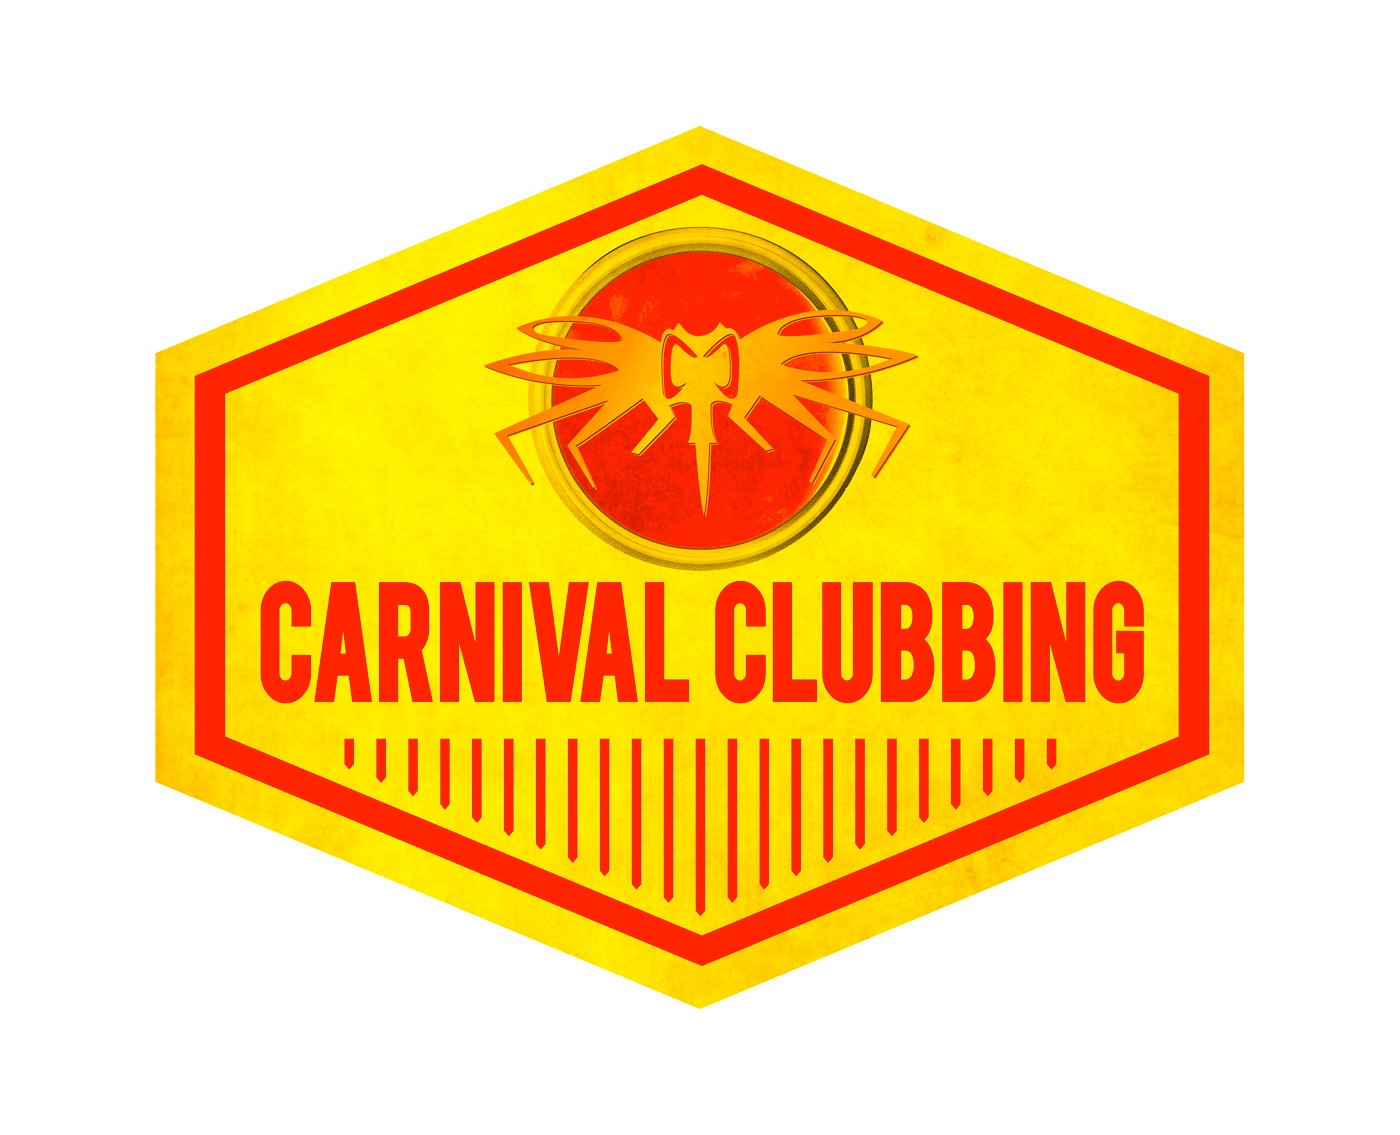 Carnival clubbing 87271368529_984623119_o.jpg